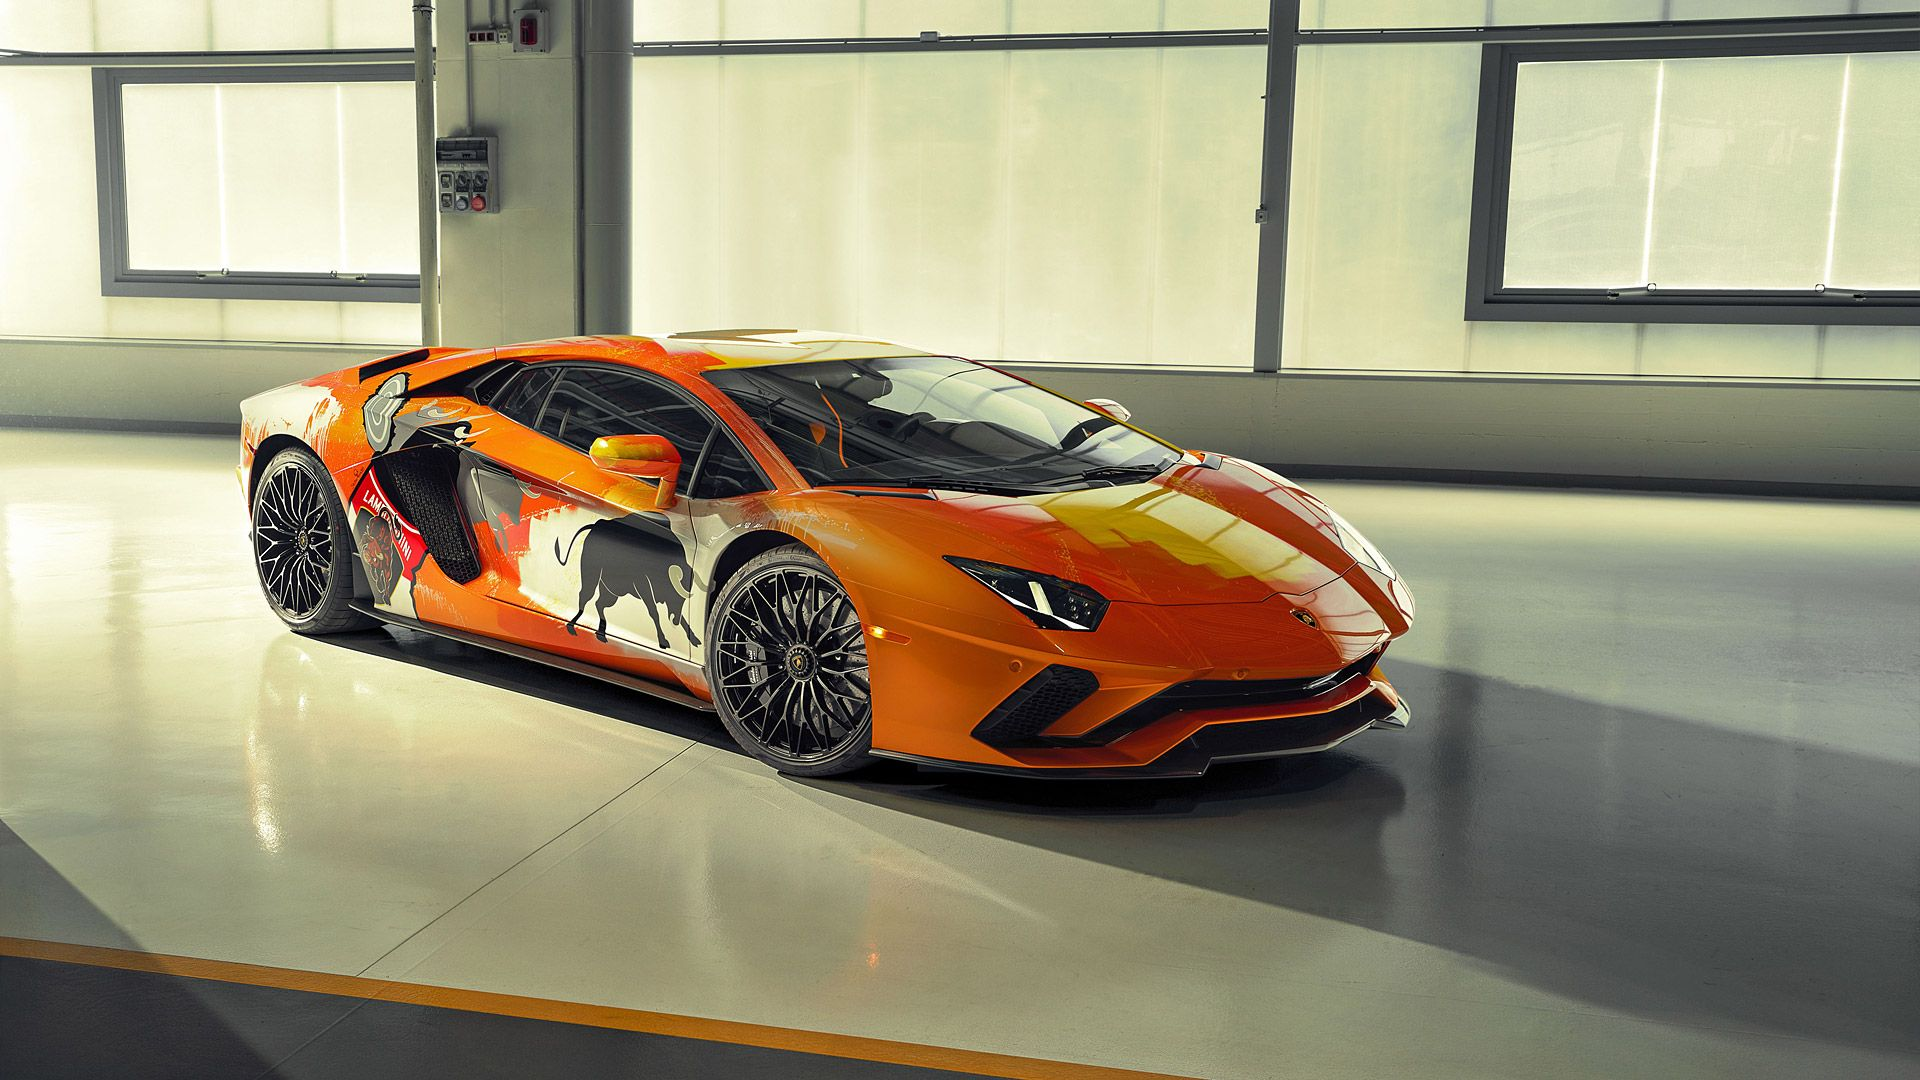 Rent Lamborghini Aventador In Dubai A Legend In Its Own Right Myride Ae In 2020 Lamborghini Aventador Lamborghini Sports Coupe